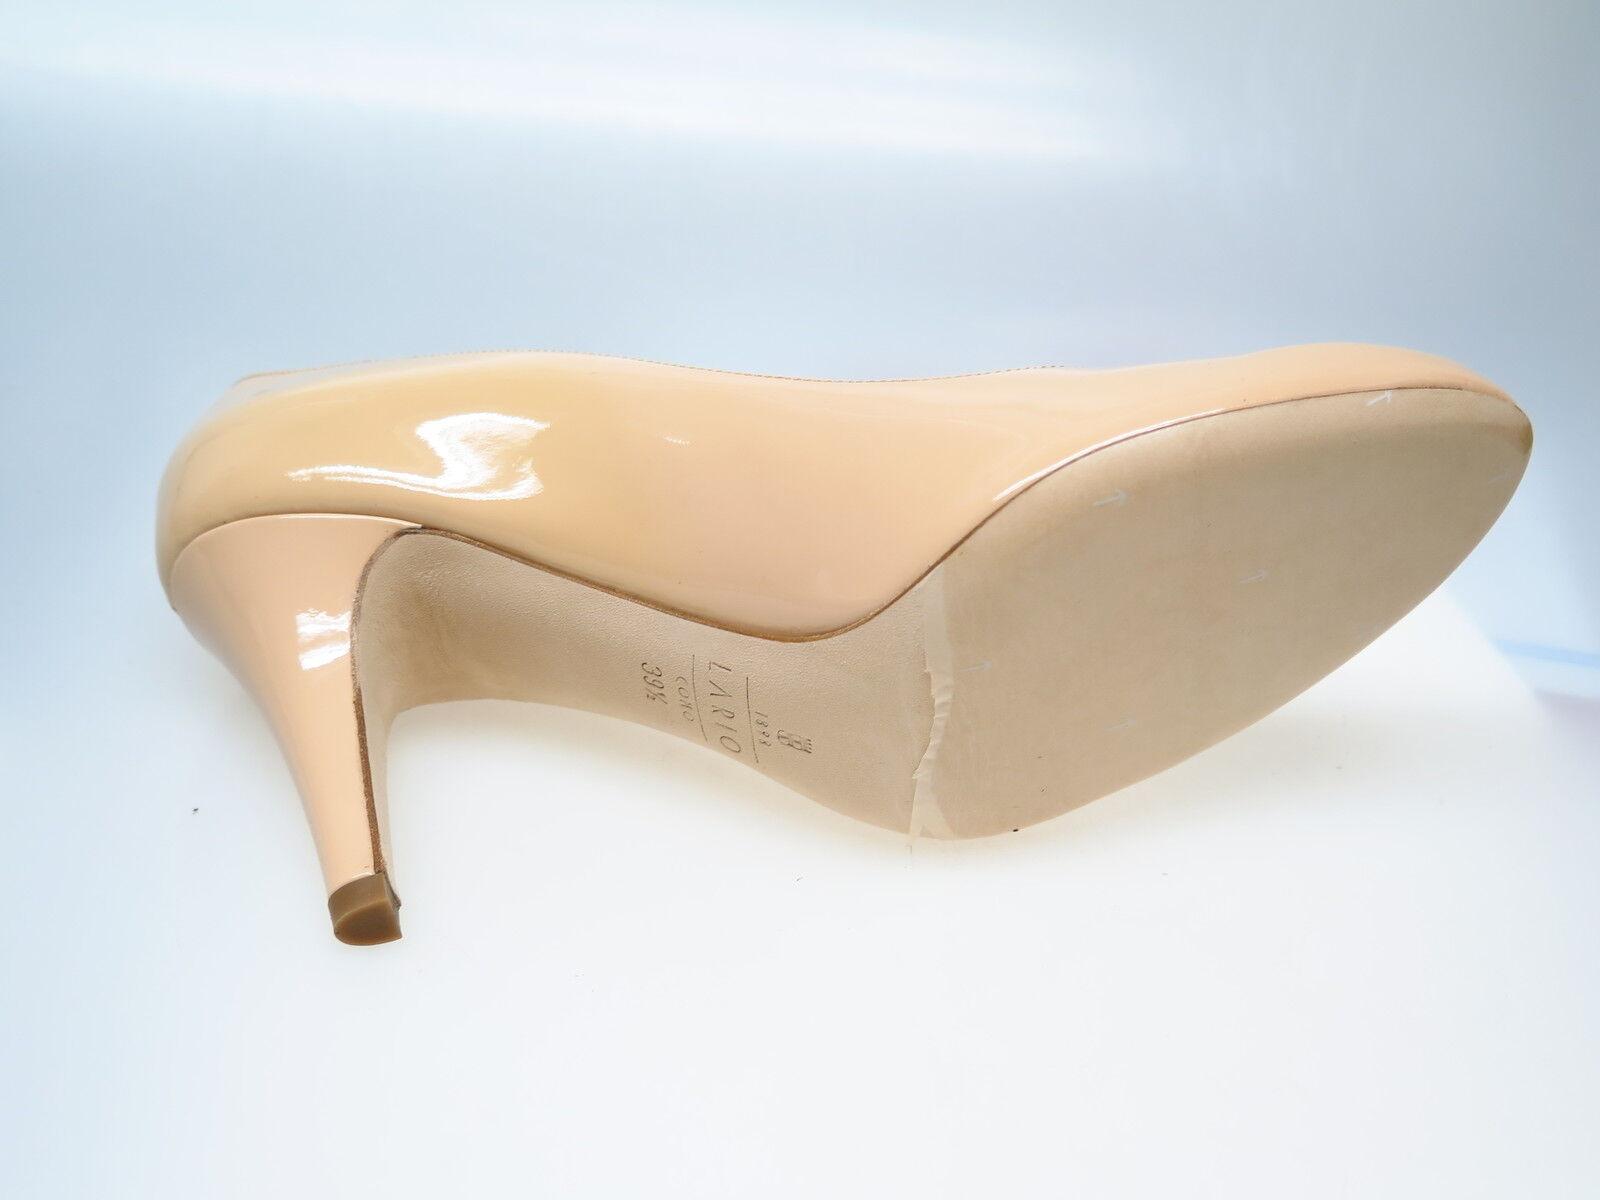 Lario Como 1898 Scarpe VERNICE da Donna Designer lr1056 VERNICE Scarpe NUDE balmi tg. 37 NUOVO f9ca8b